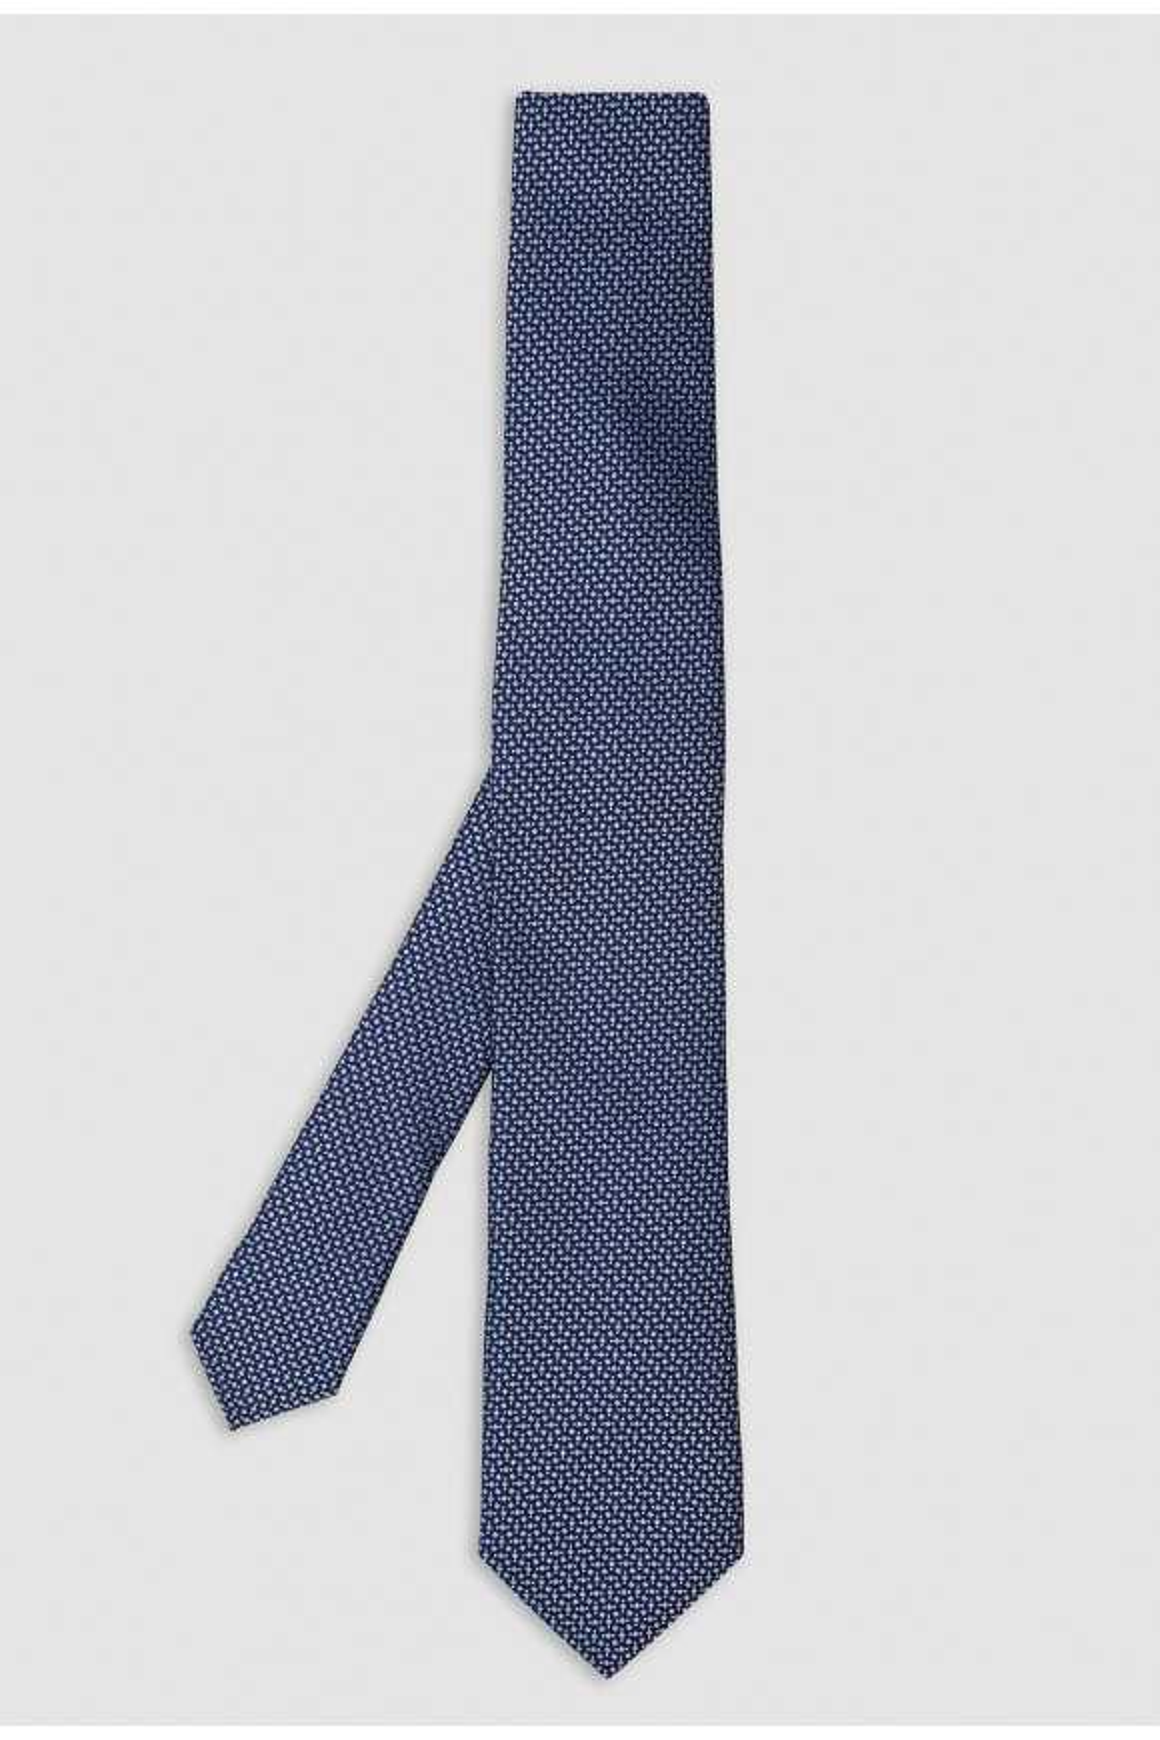 Cravate Bleu Micromotif Soie